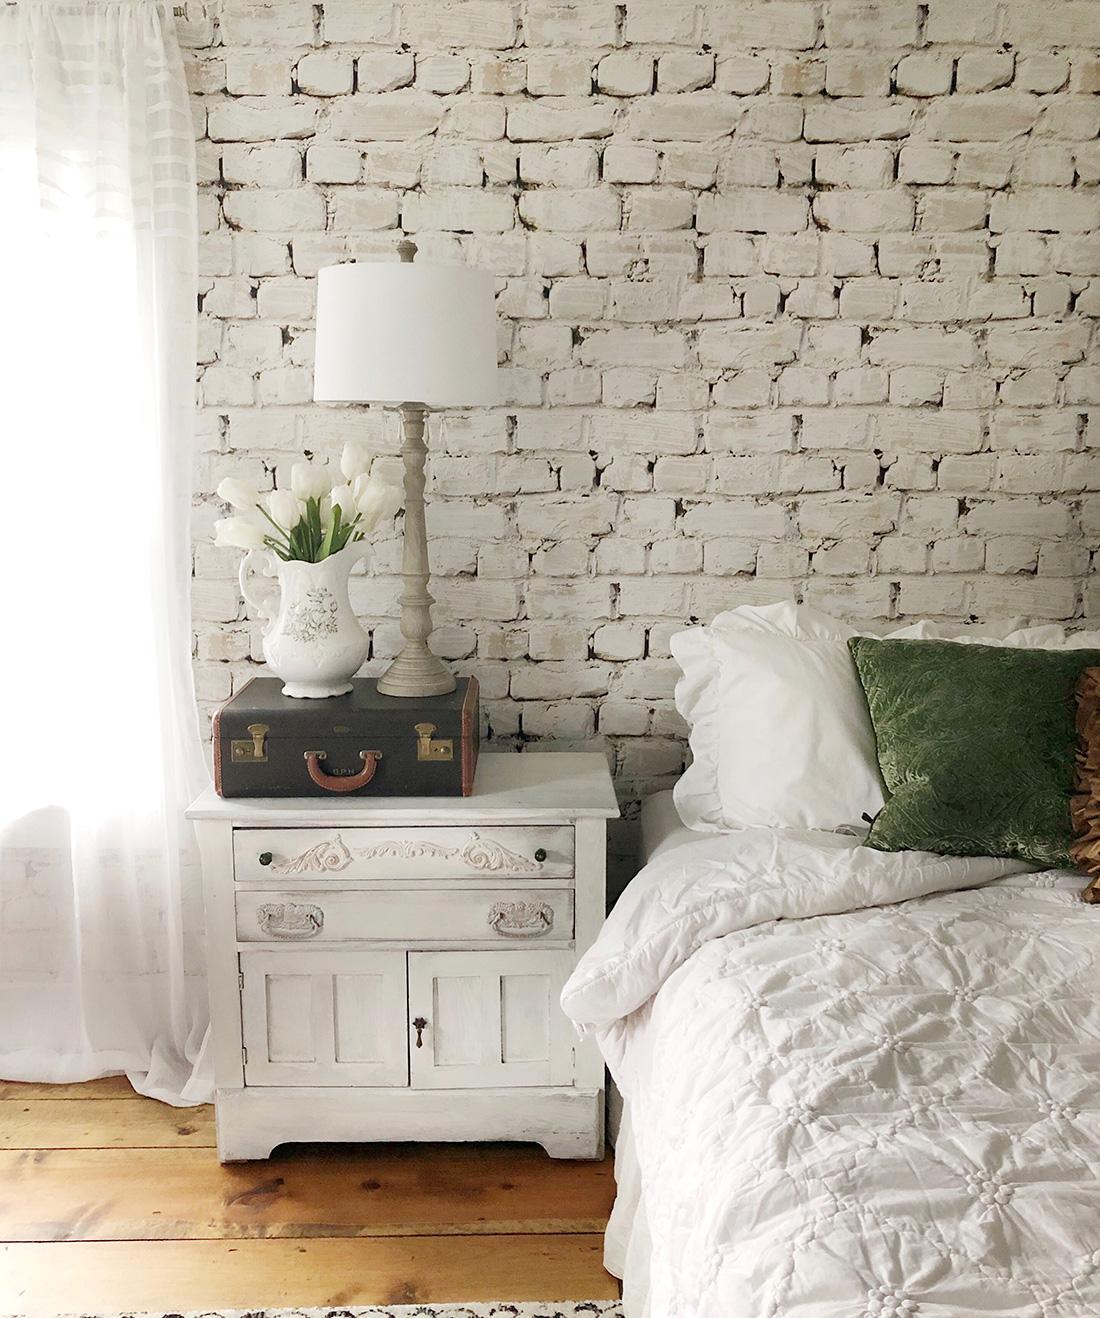 Whitewash Bricks Wallpaper, White Rustic Brick Wallpaper